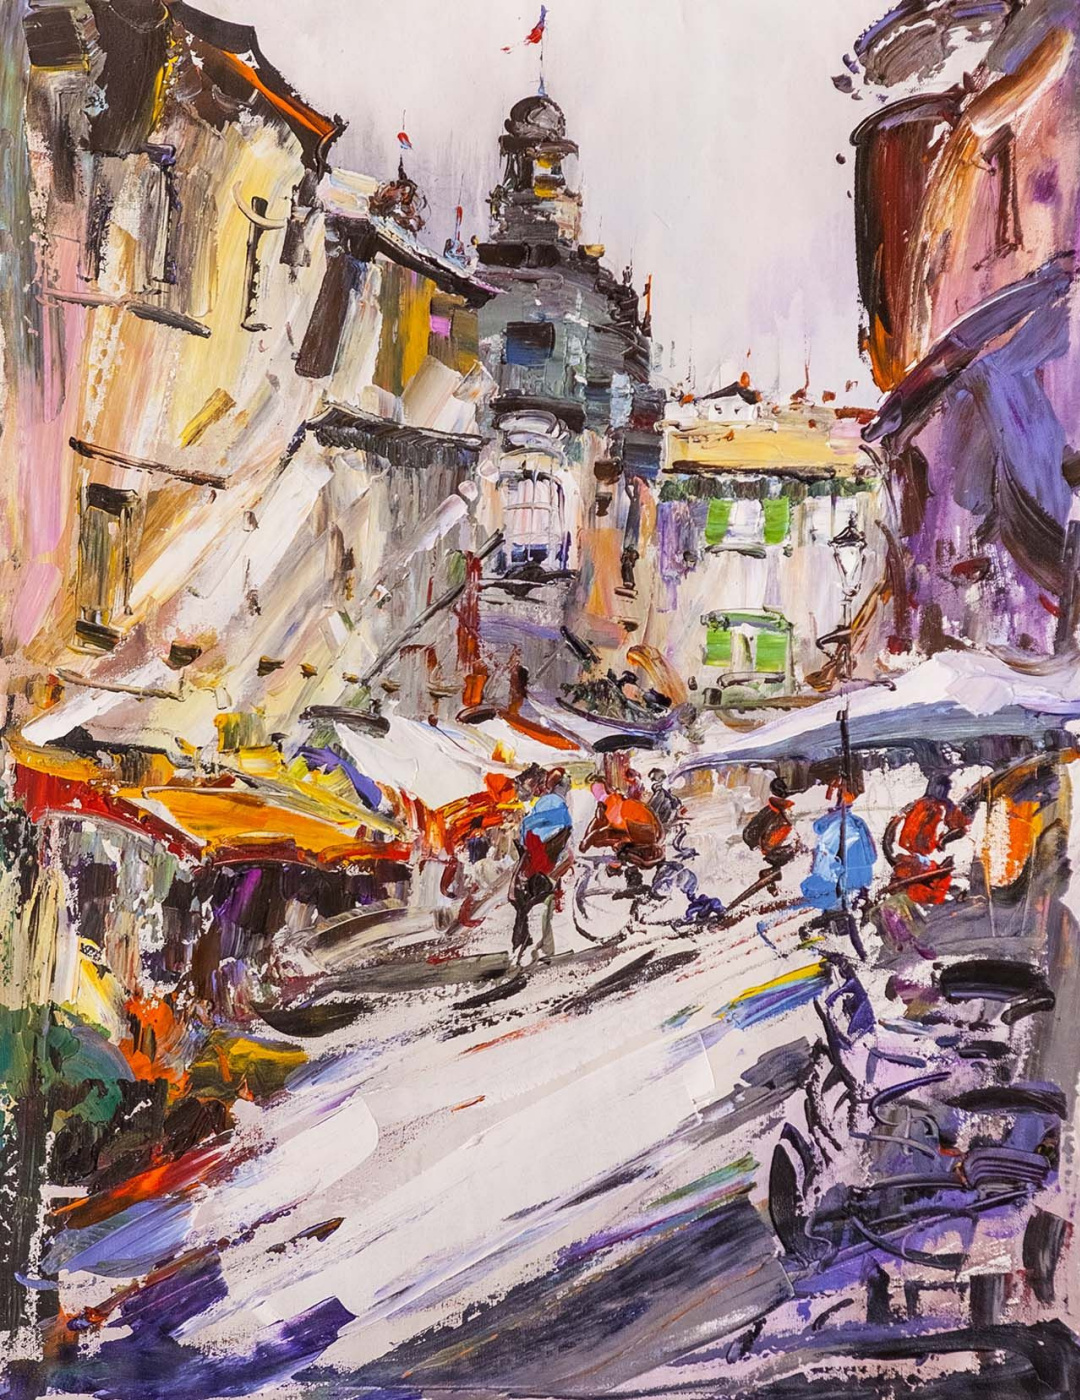 Jose Rodriguez. Walking through the noisy city ... Traveler's sketches